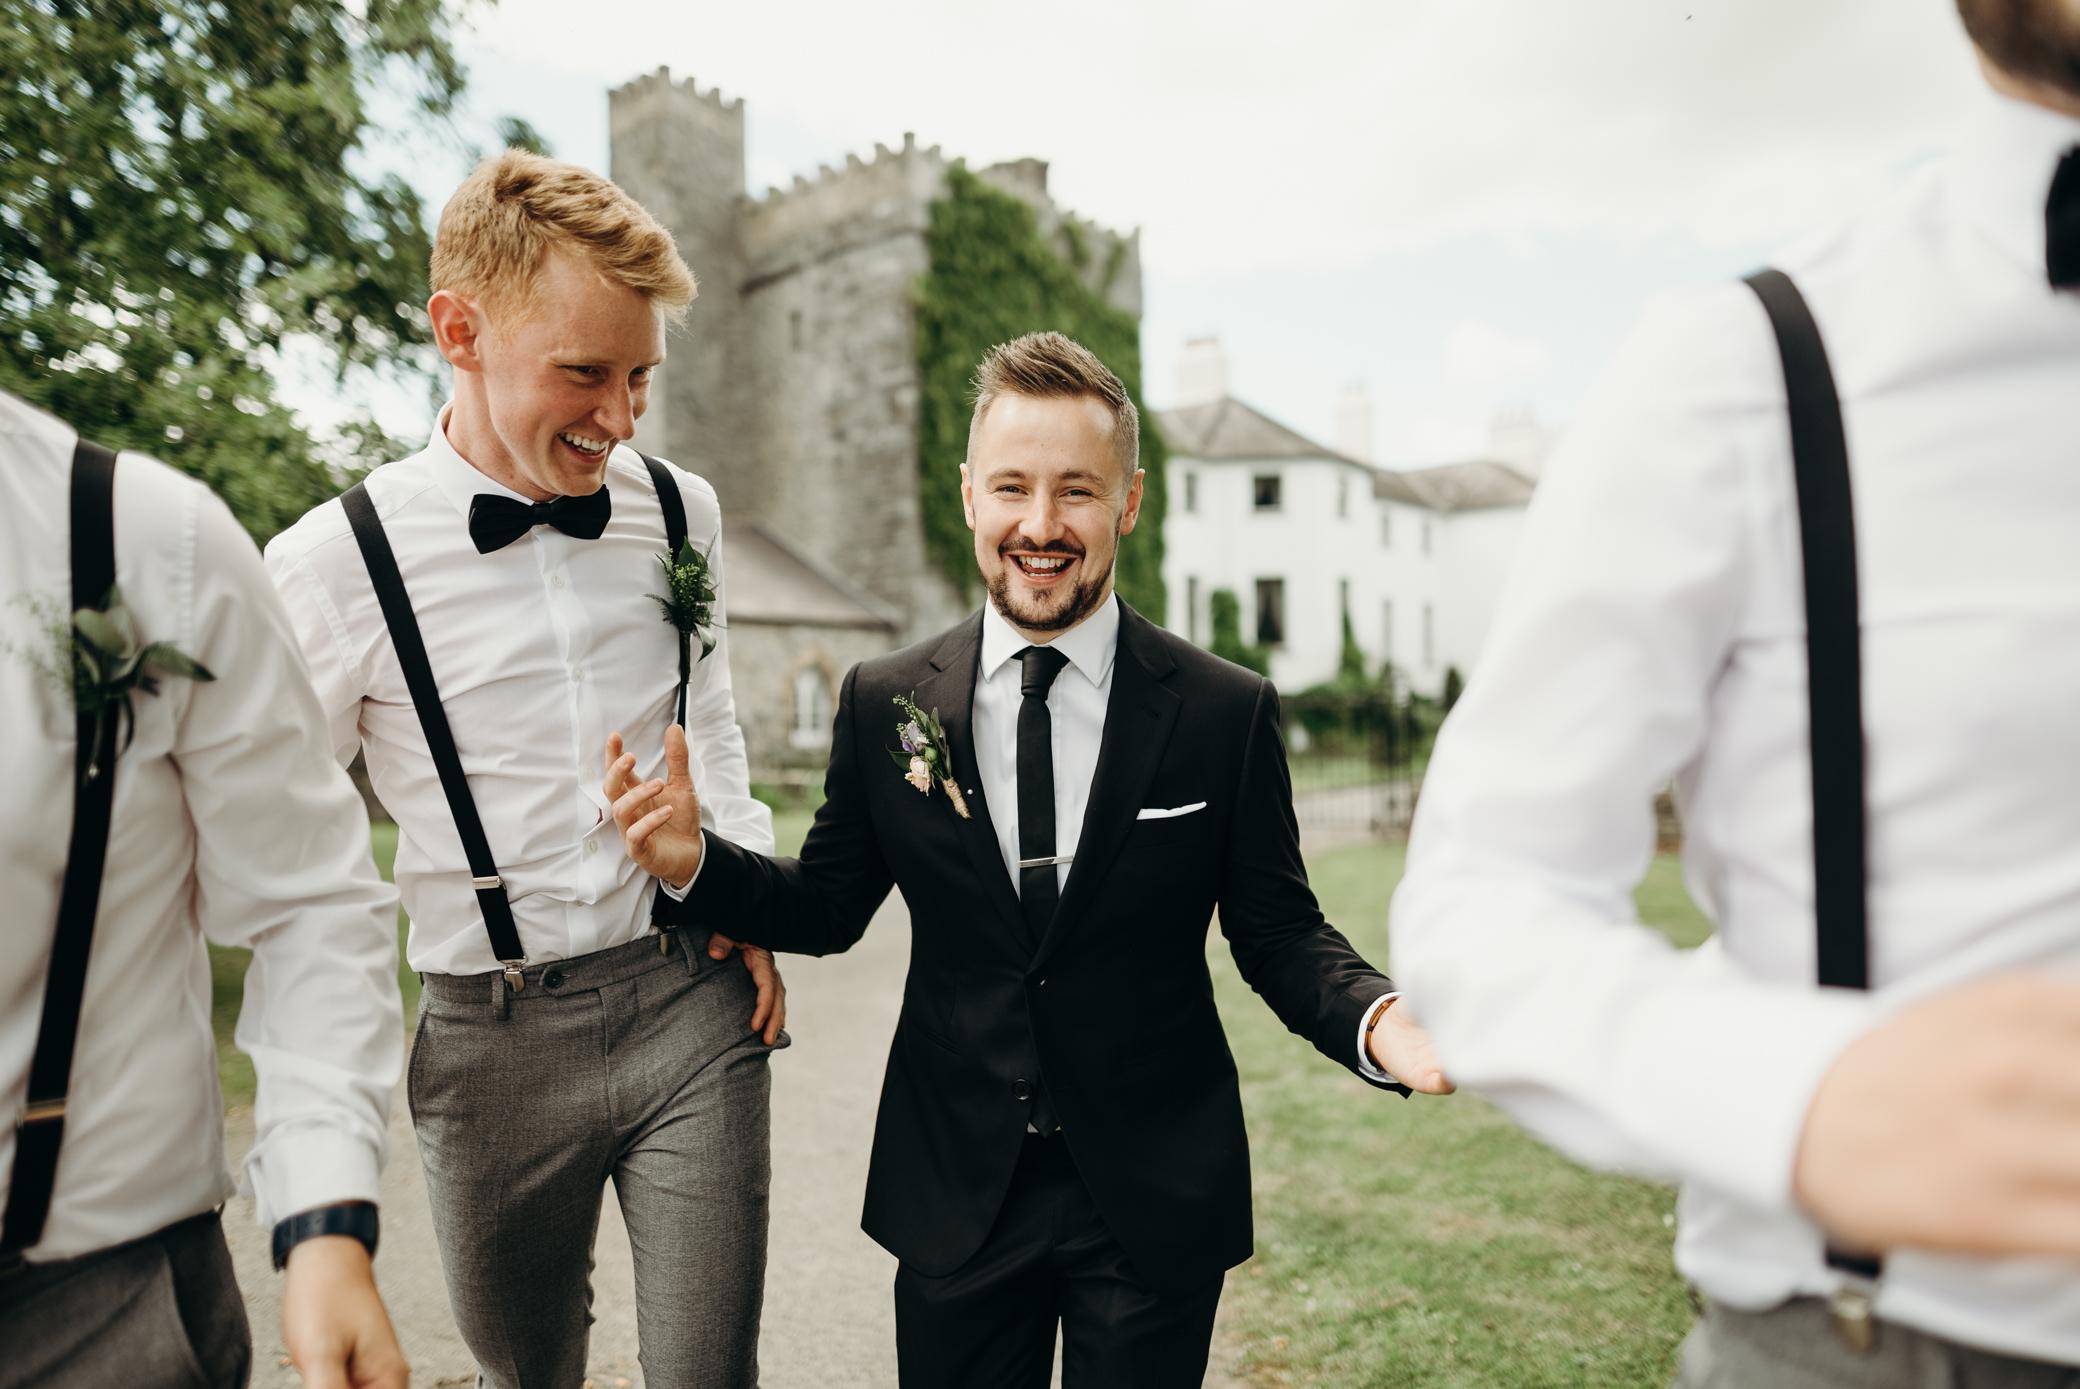 Alan&Naz- Barberstown Castle Wedding - Wedding photographer Ireland-96.jpg